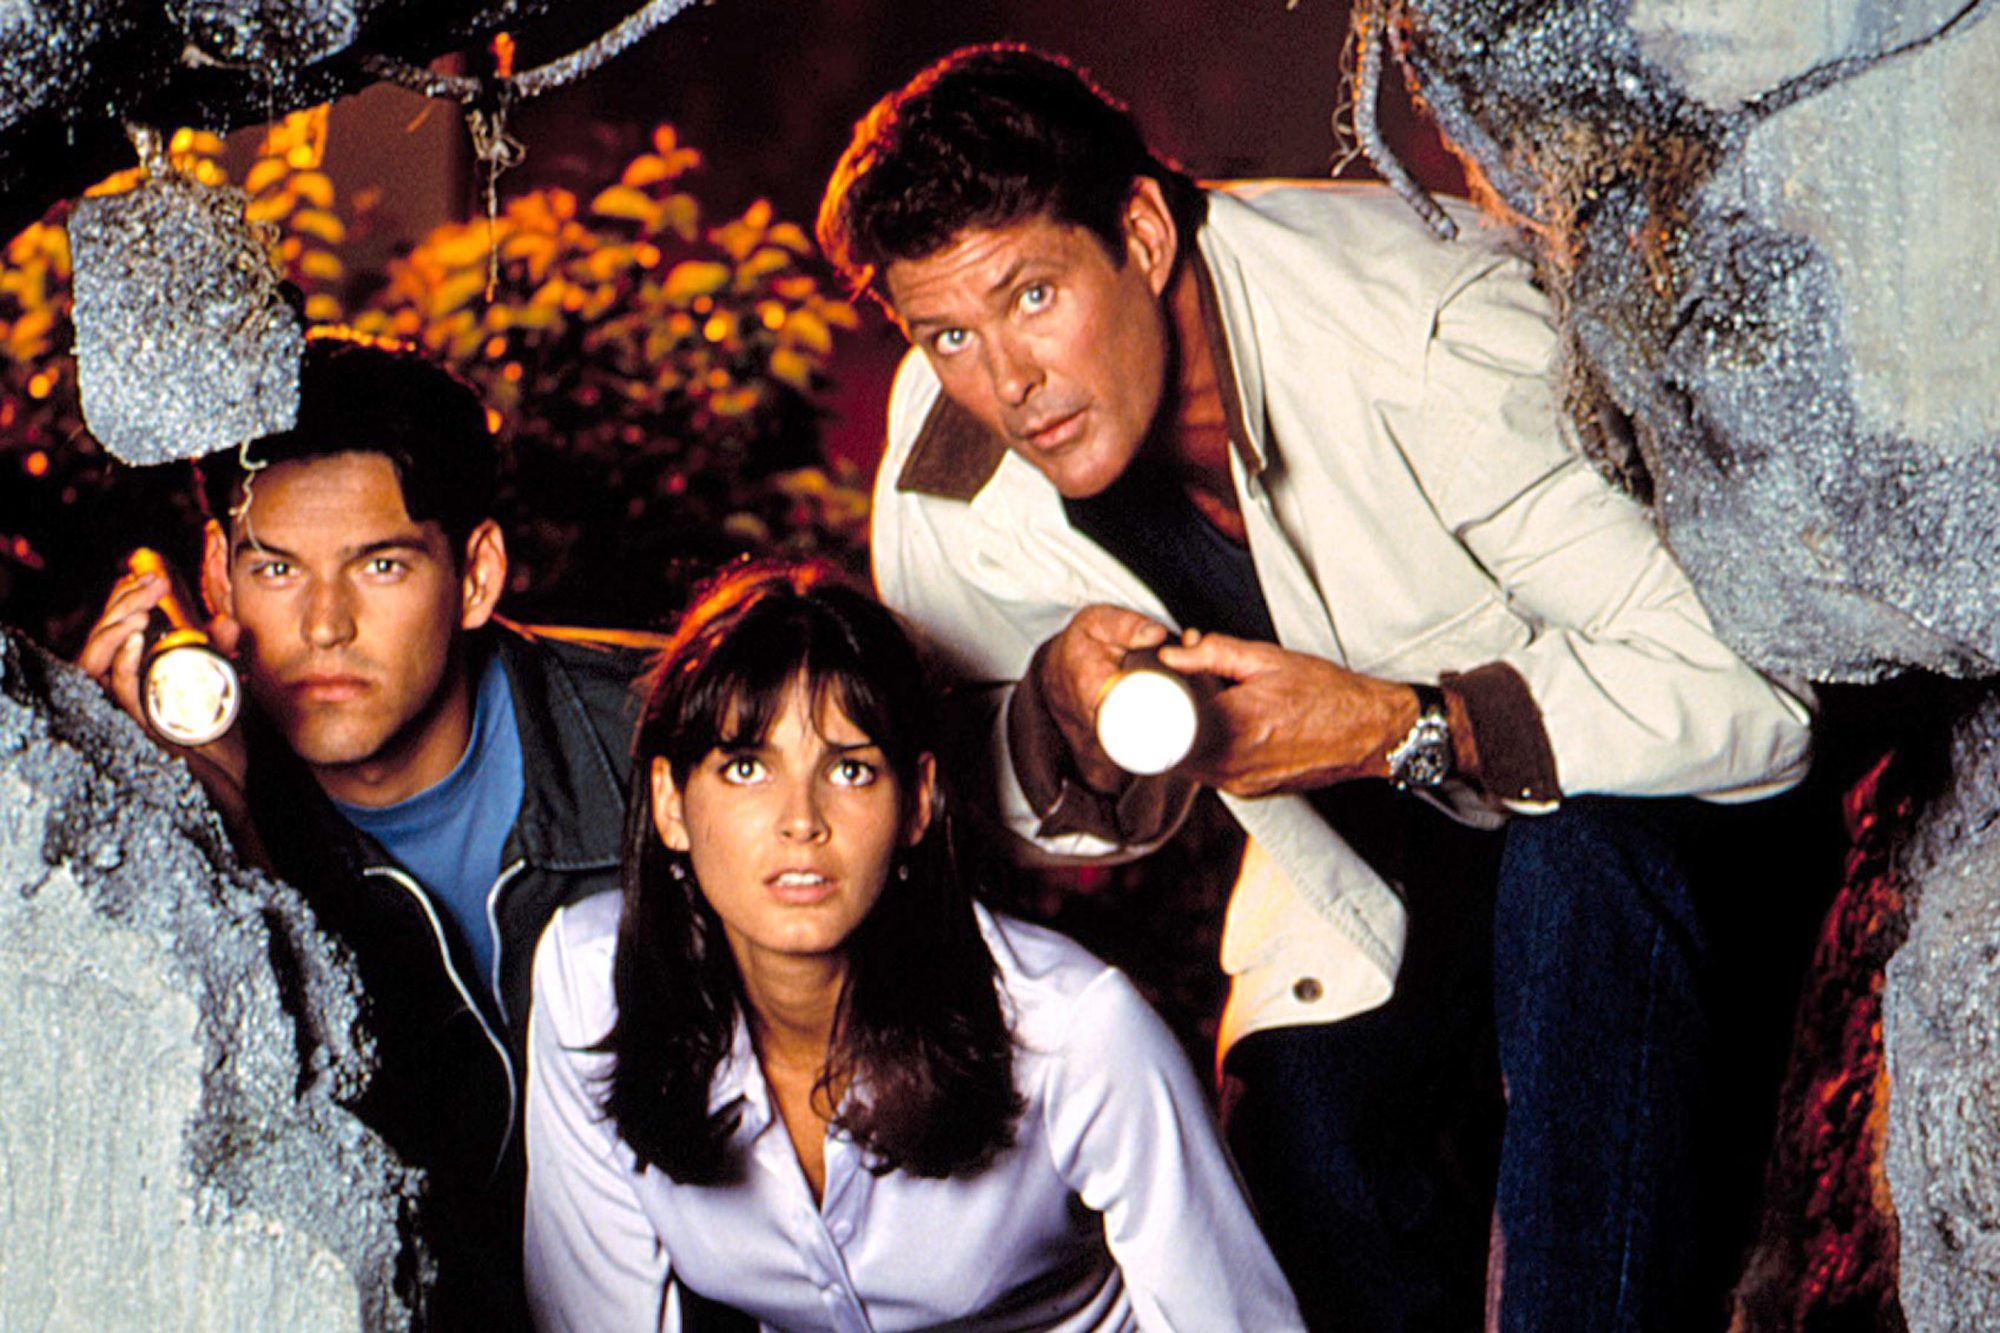 BAYWATCH NIGHTS, Eddie Cibrian, Angie Harmon, David Hasselhoff, 1995-97. © All American Television /